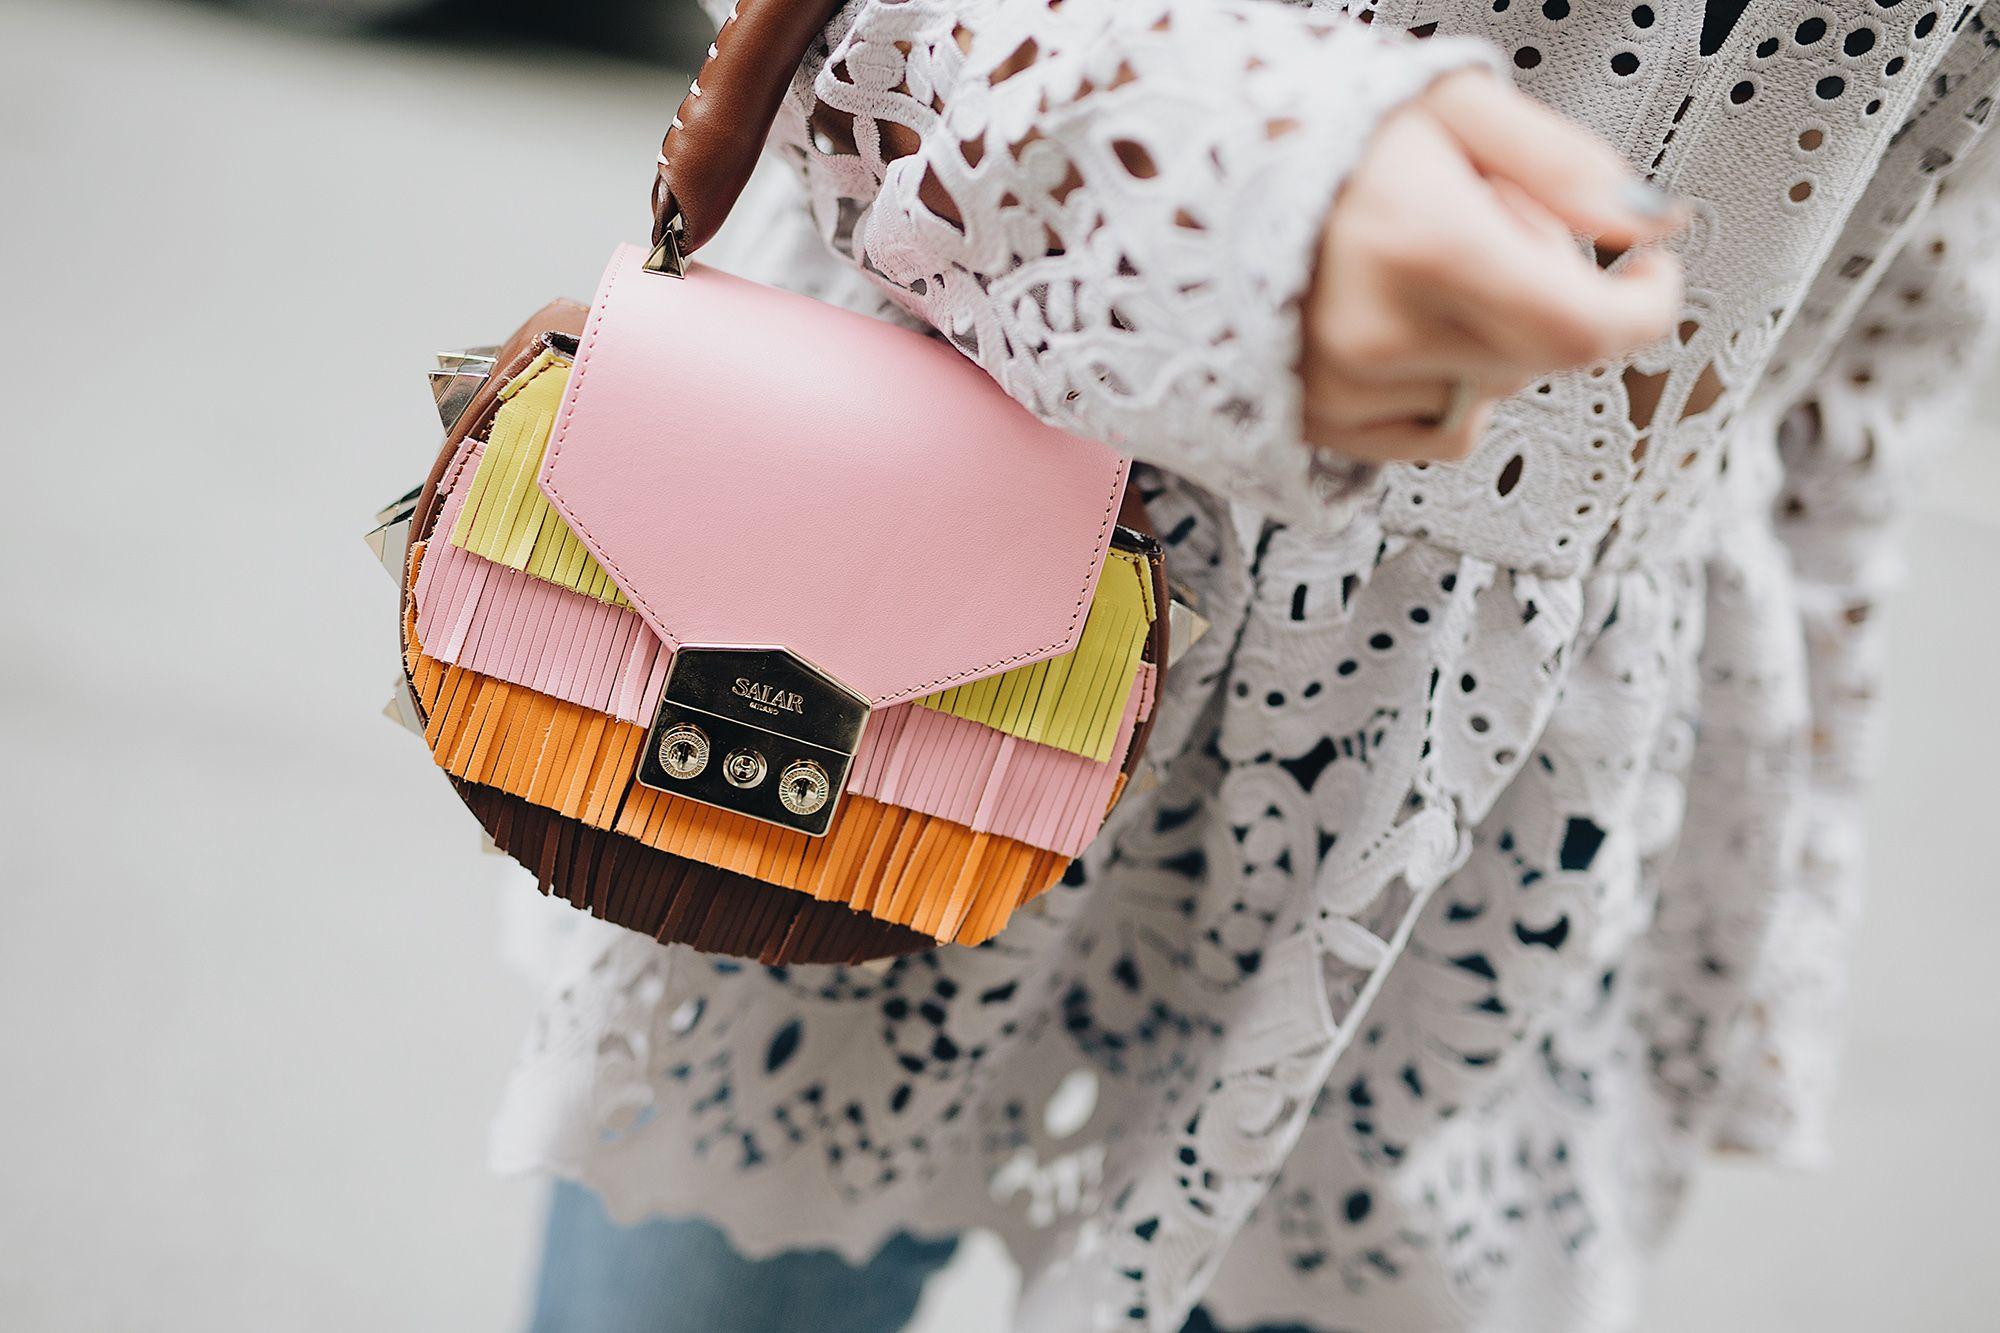 51d0bebc9e4 Hot Bag Alert: Salar Milano Mimi Aloha   fancy things   Pinterest ...